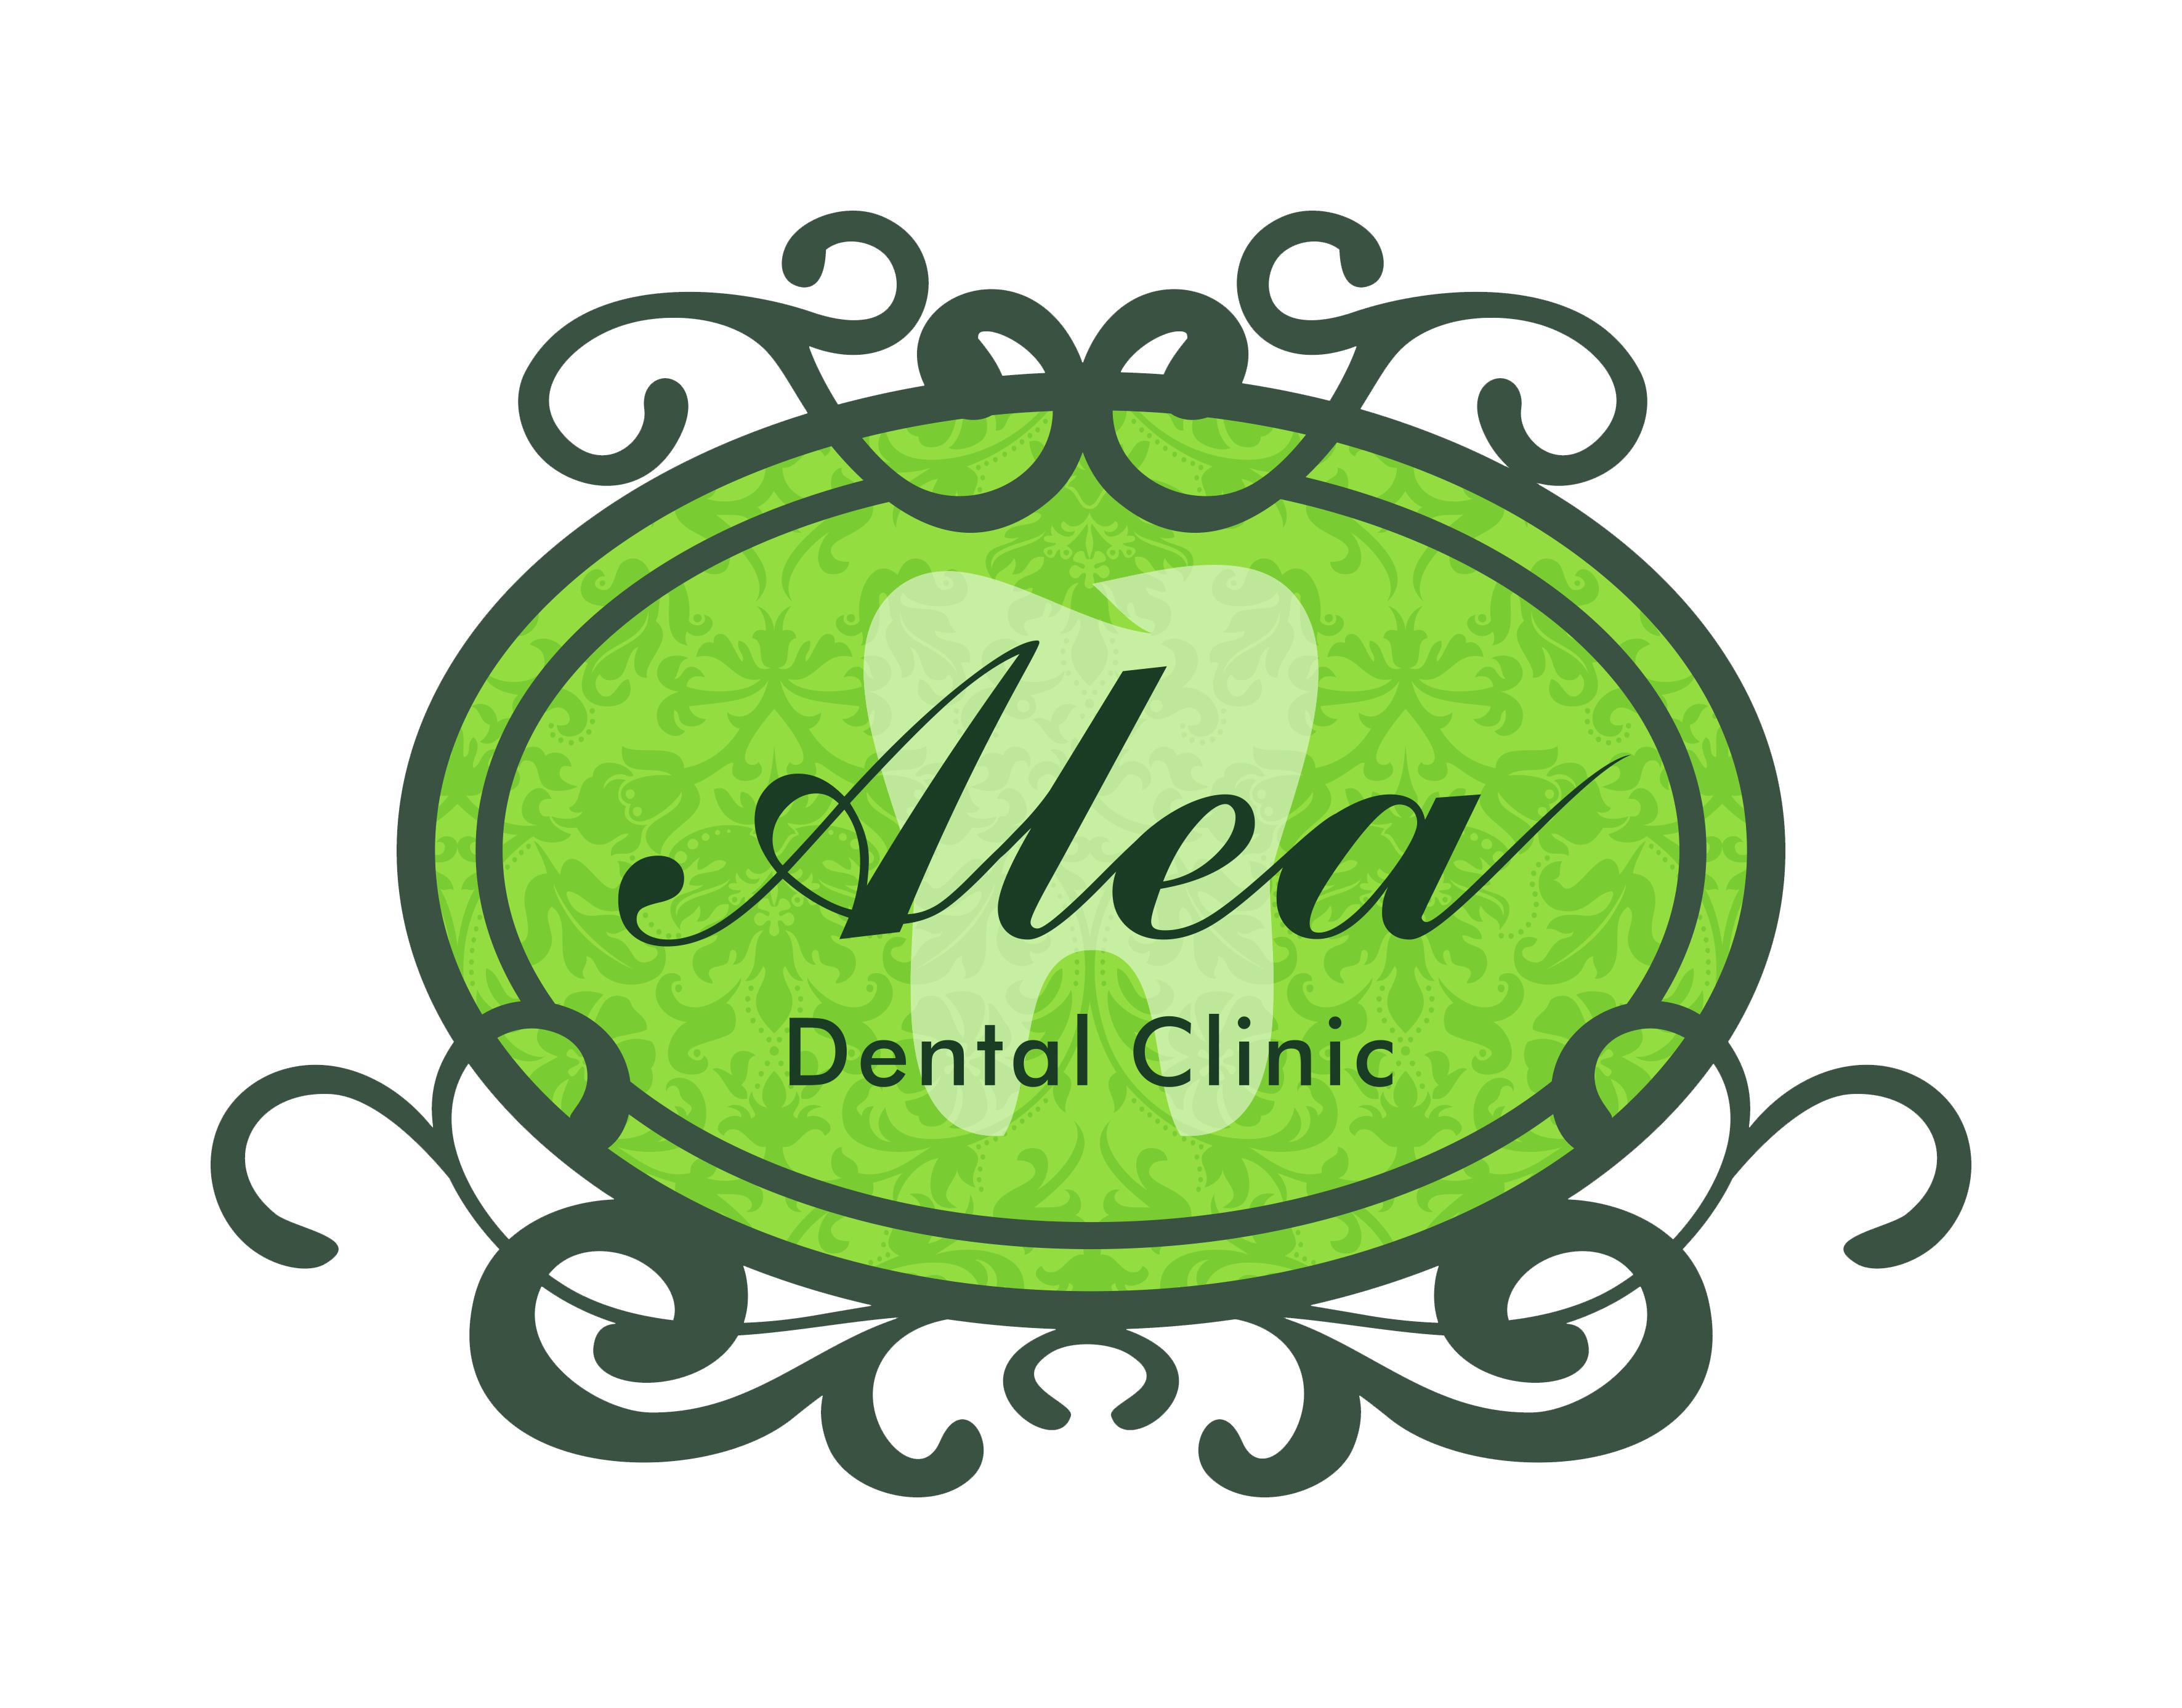 Alea Dental Clinic